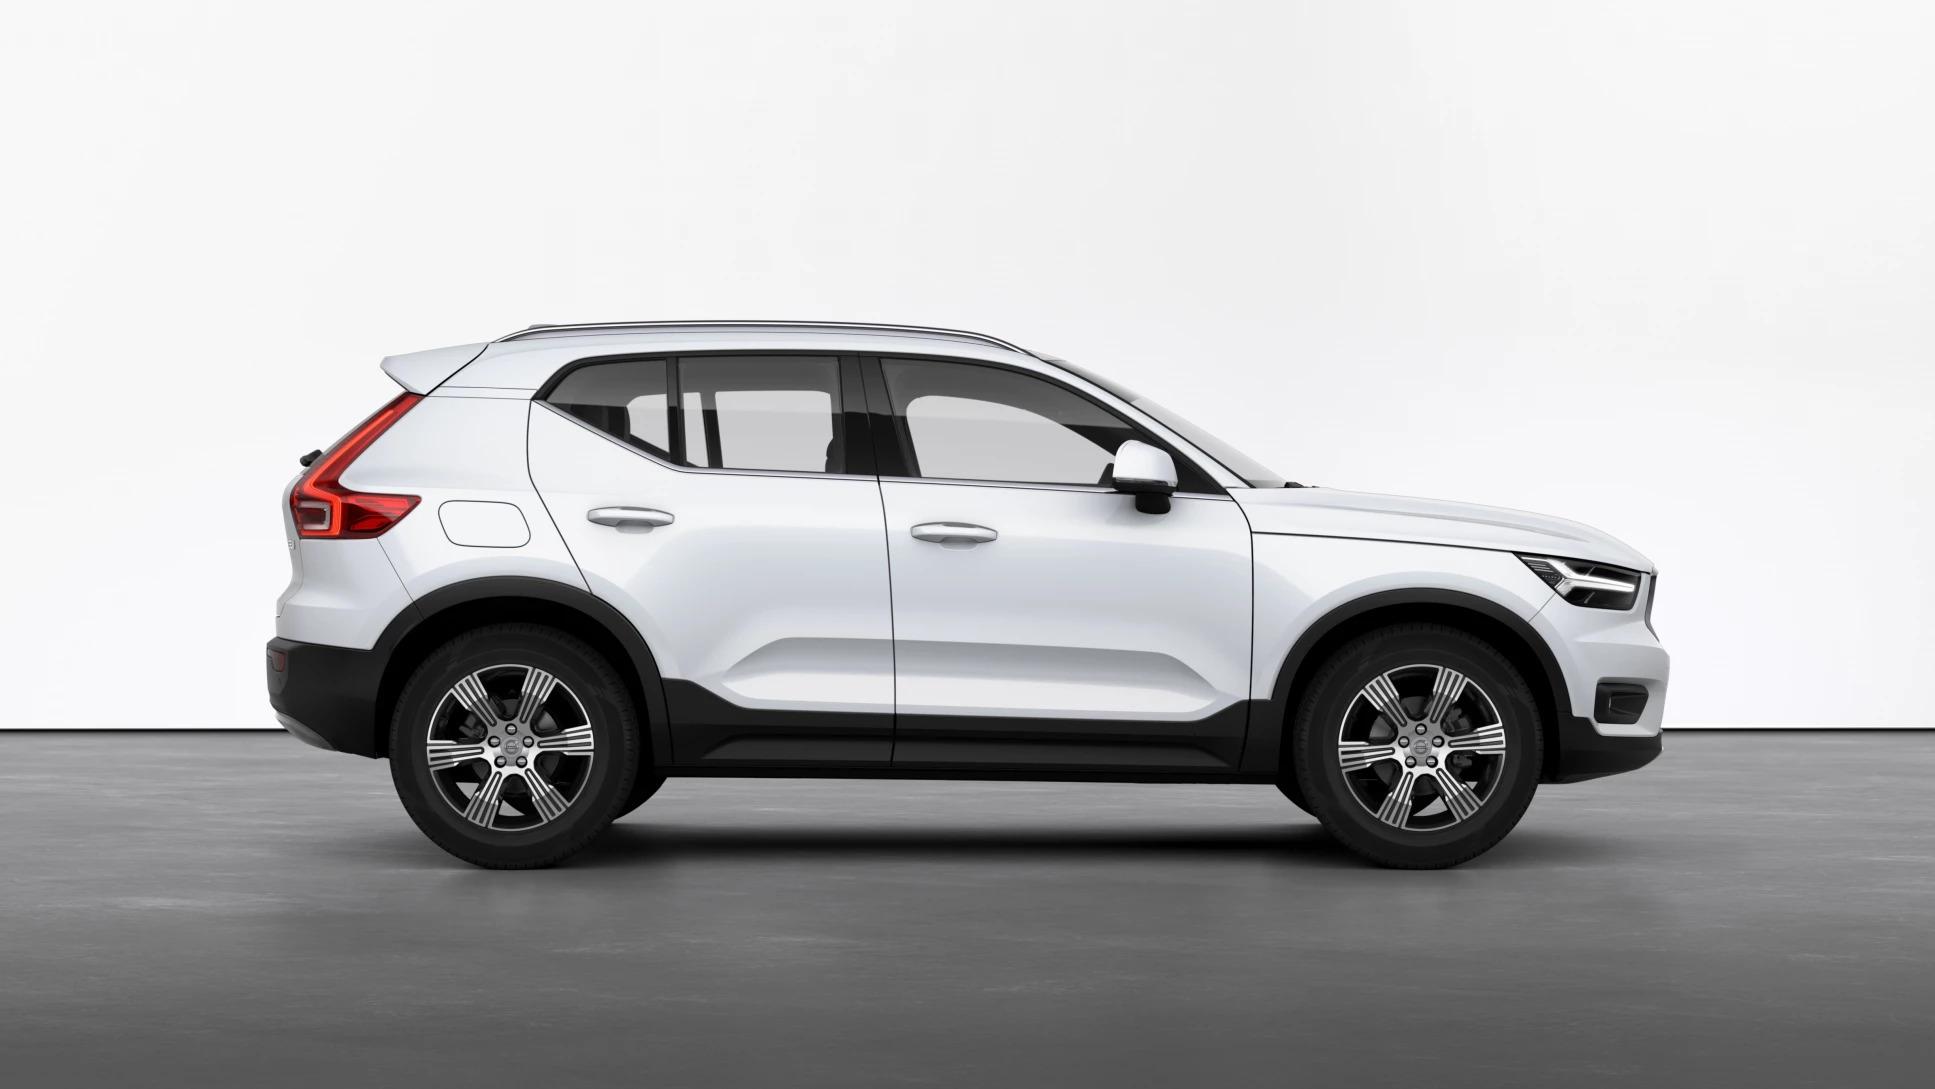 Volvo XC40 B4 (Petrol) Mild Hybrid AT8 AWD Inscription 12483